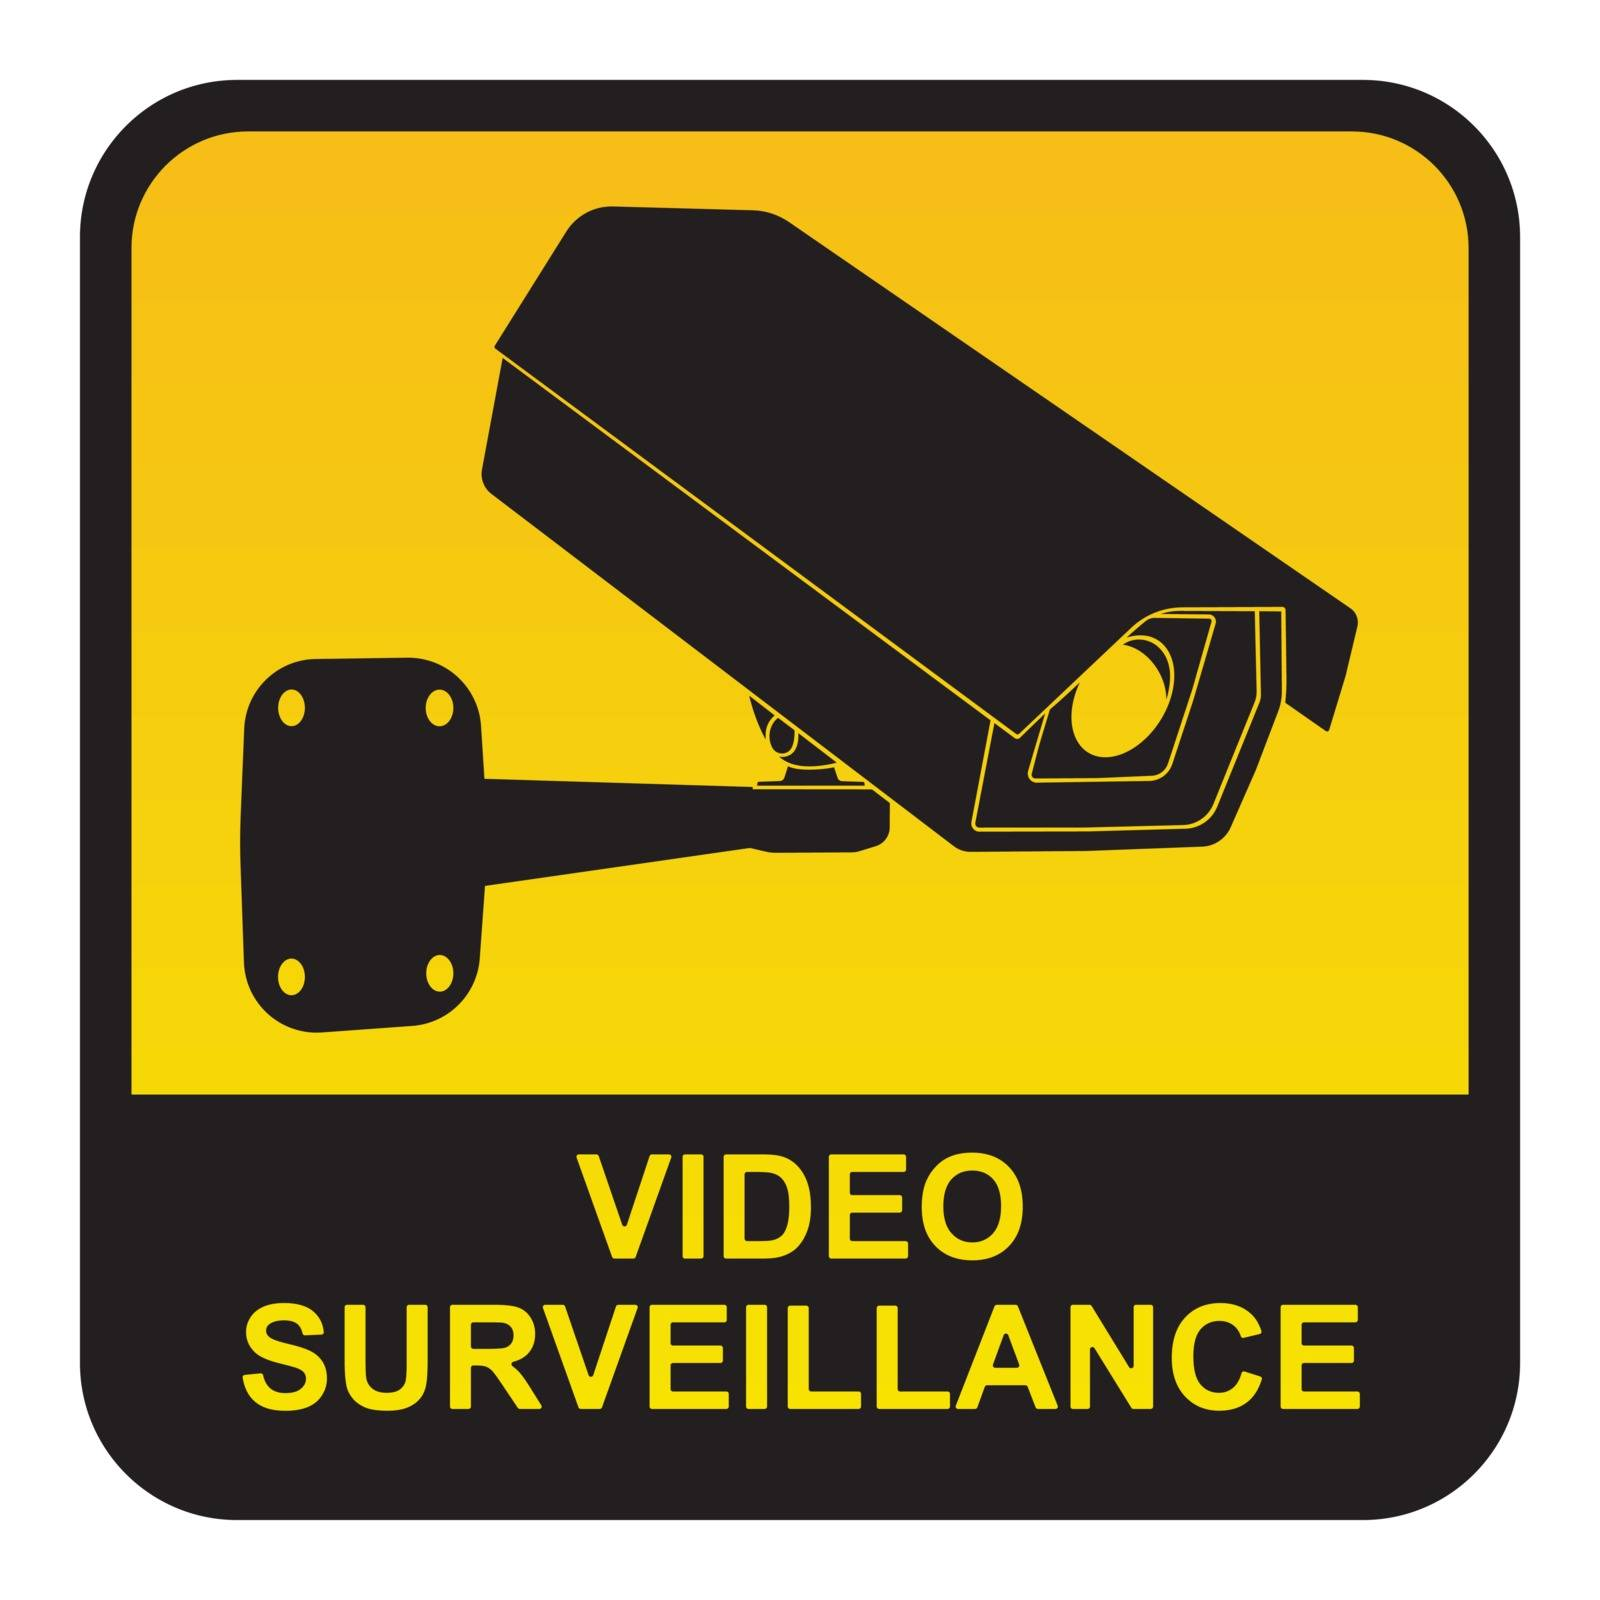 Warning sticker for video surveillance